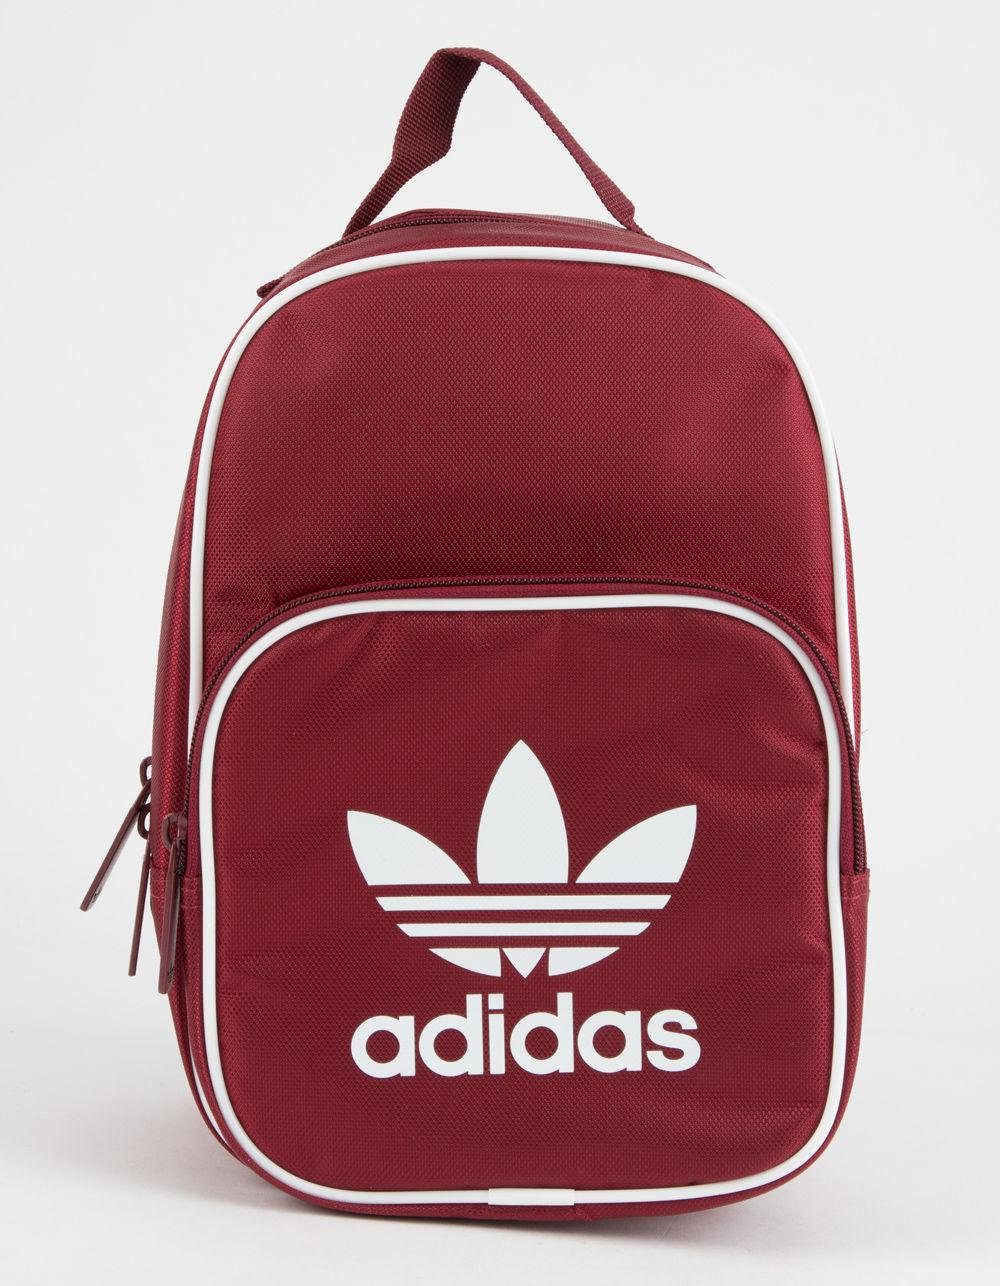 5caabf38306a ... Adidas - Red Originals Santiago Burgundy Lunch Bag - Lyst. View  fullscreen reputable site 9640b ...